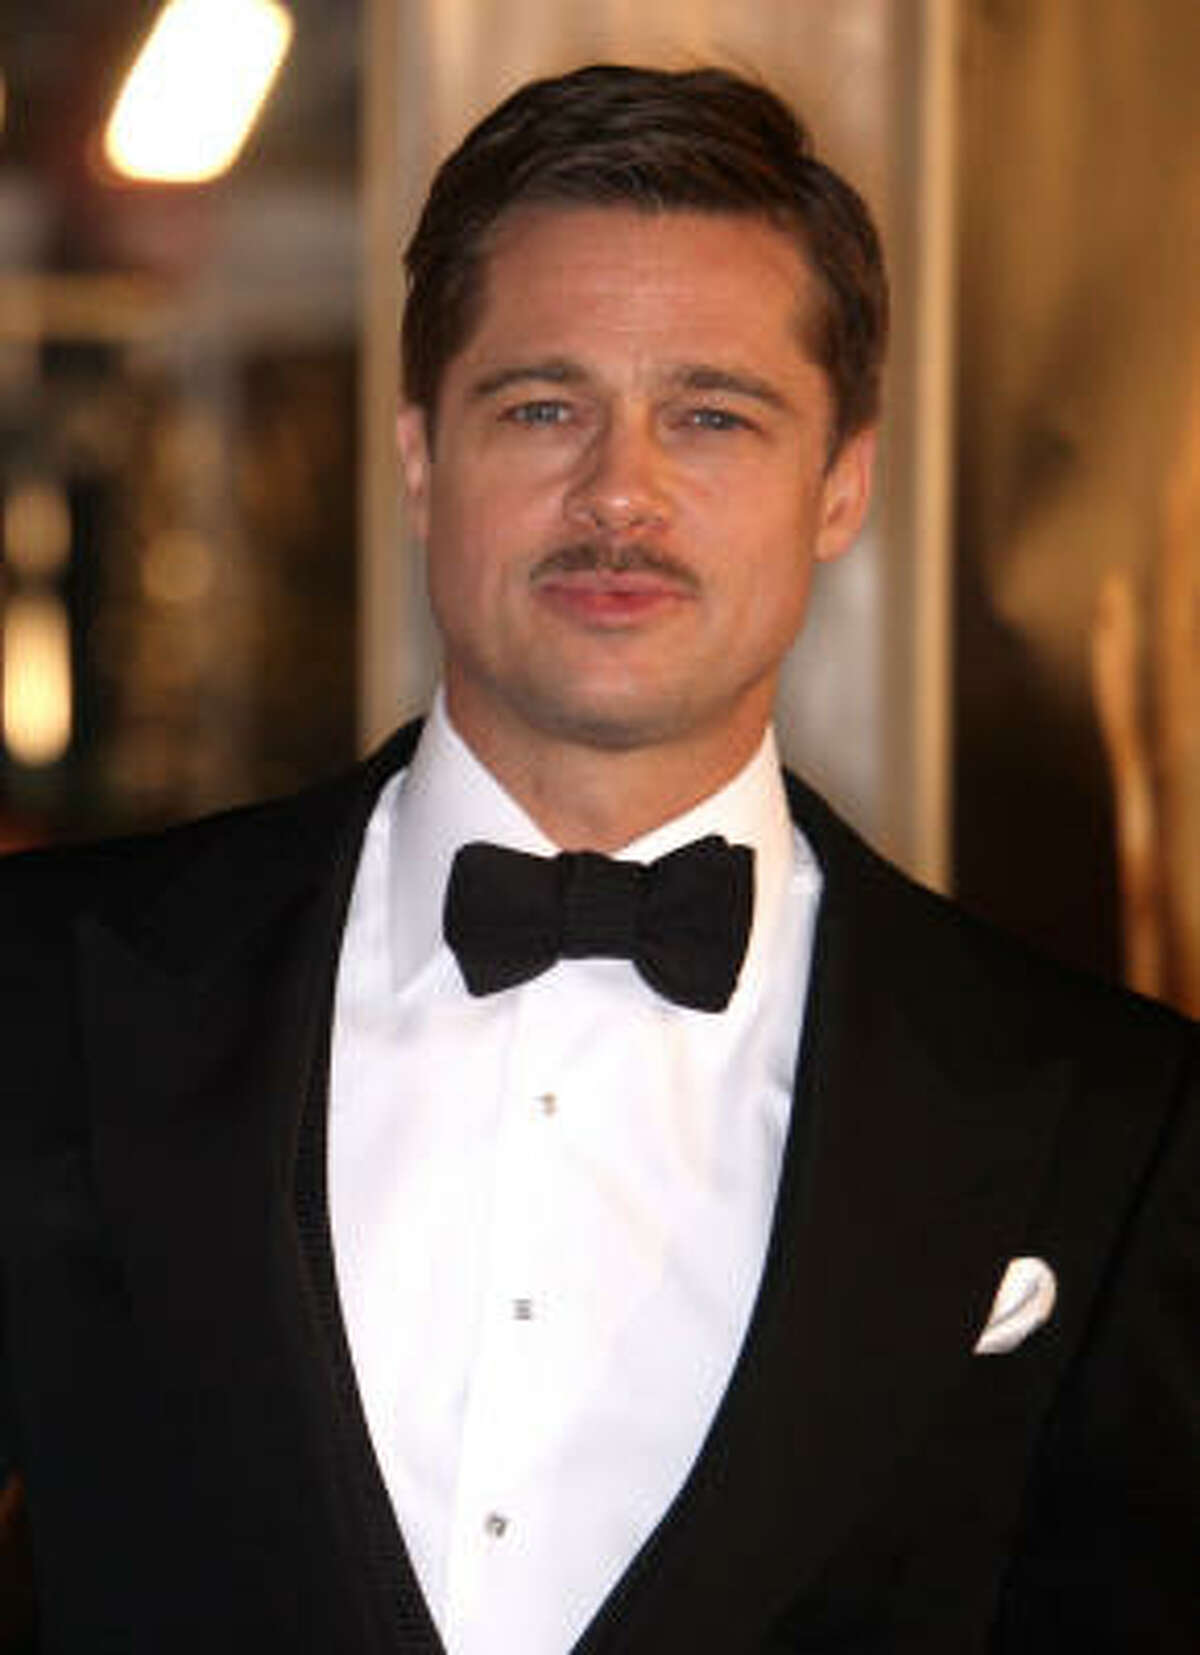 Buy: Brad Pitt